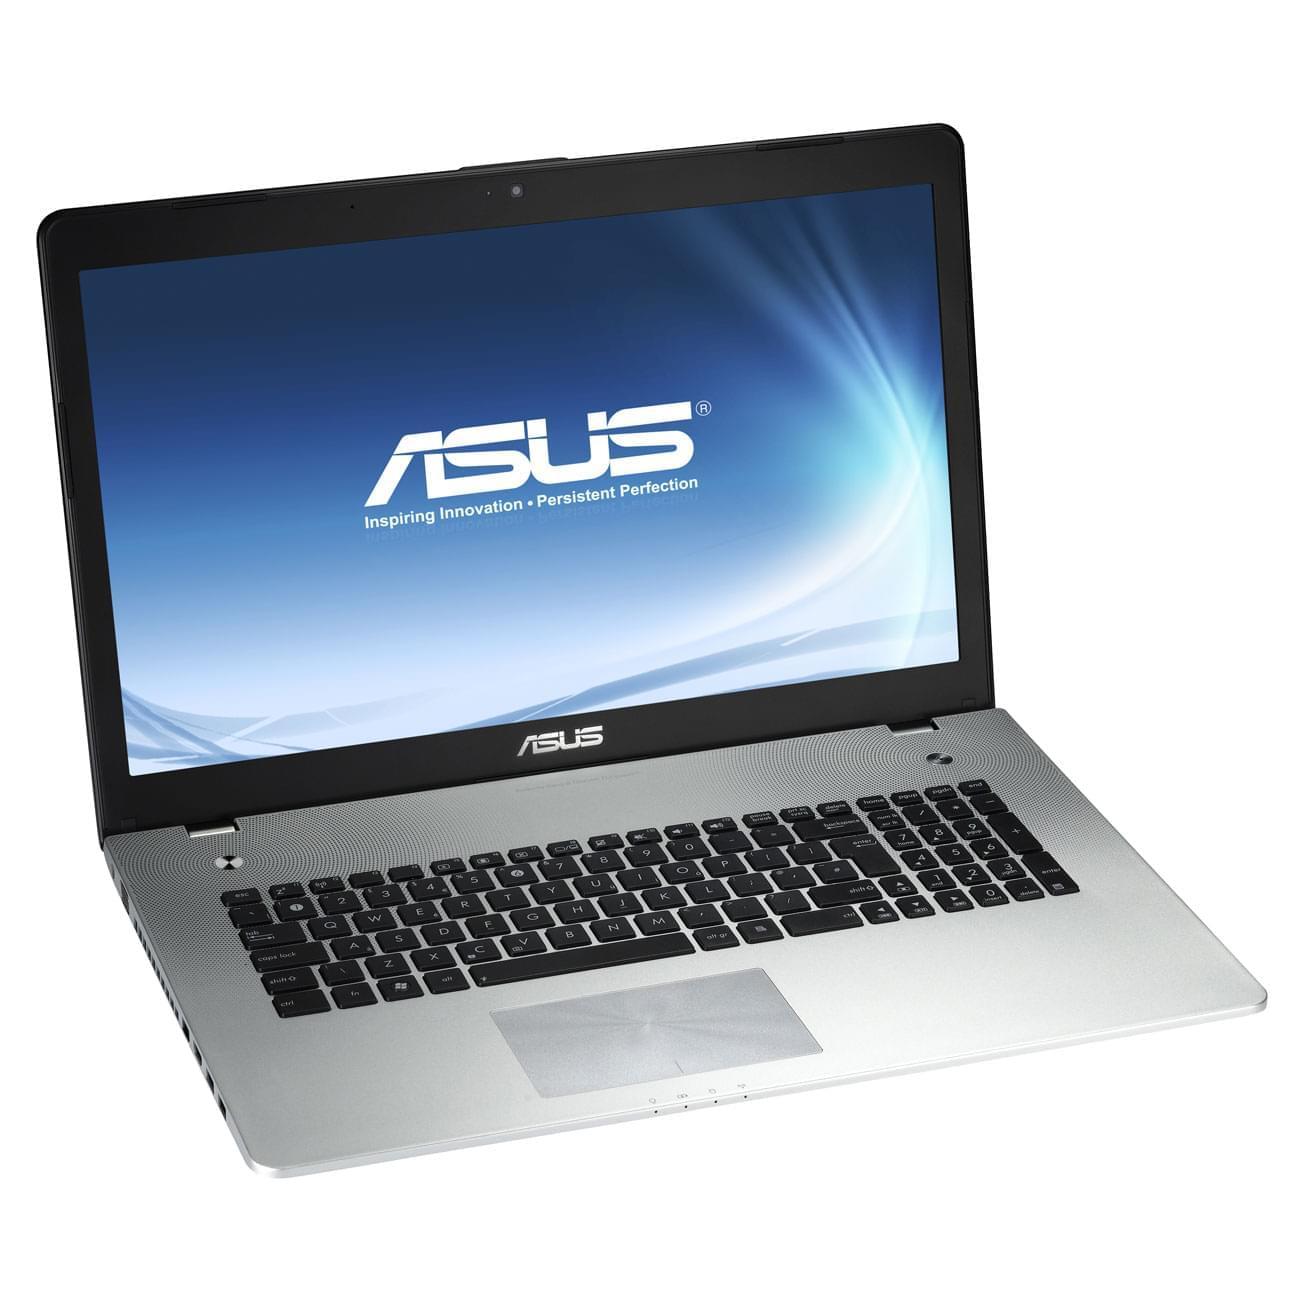 Asus N76VJ-T5004H (N76VJ-T5004H) - Achat / Vente PC Portable sur Cybertek.fr - 0